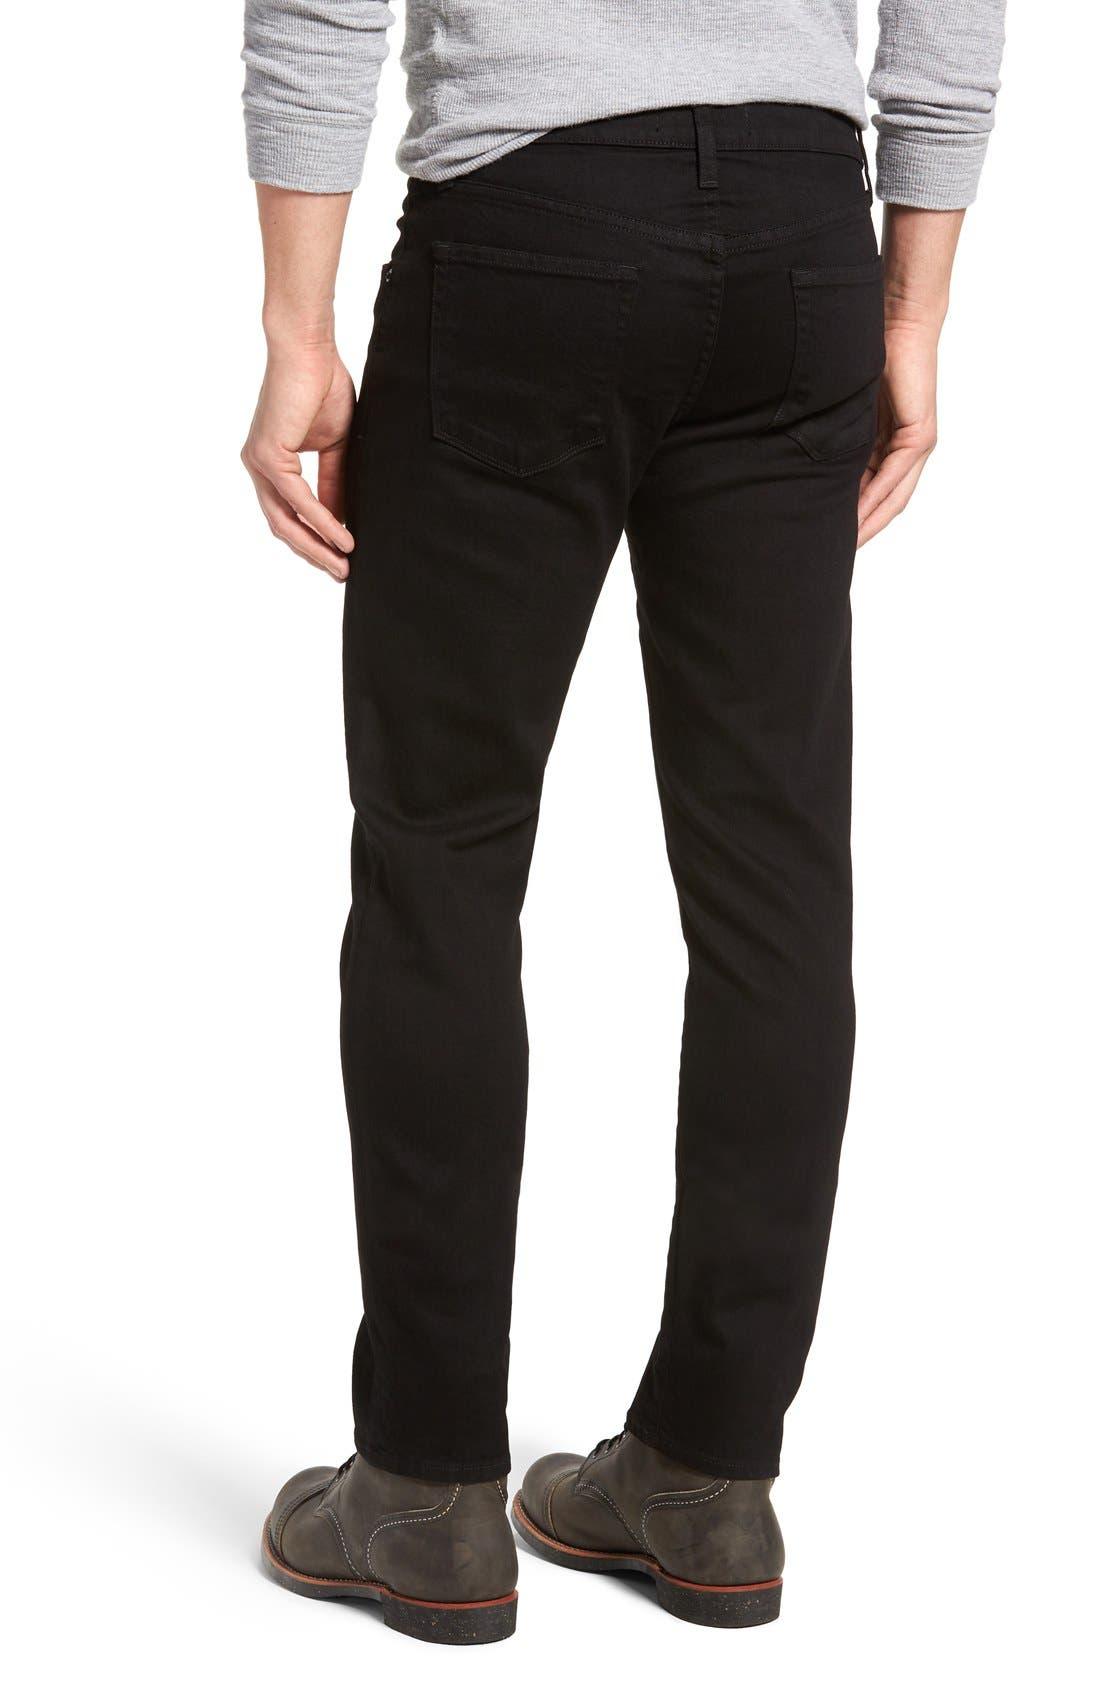 J BRAND, Tyler Slim Fit Jeans, Alternate thumbnail 4, color, TRIVOR BLACK